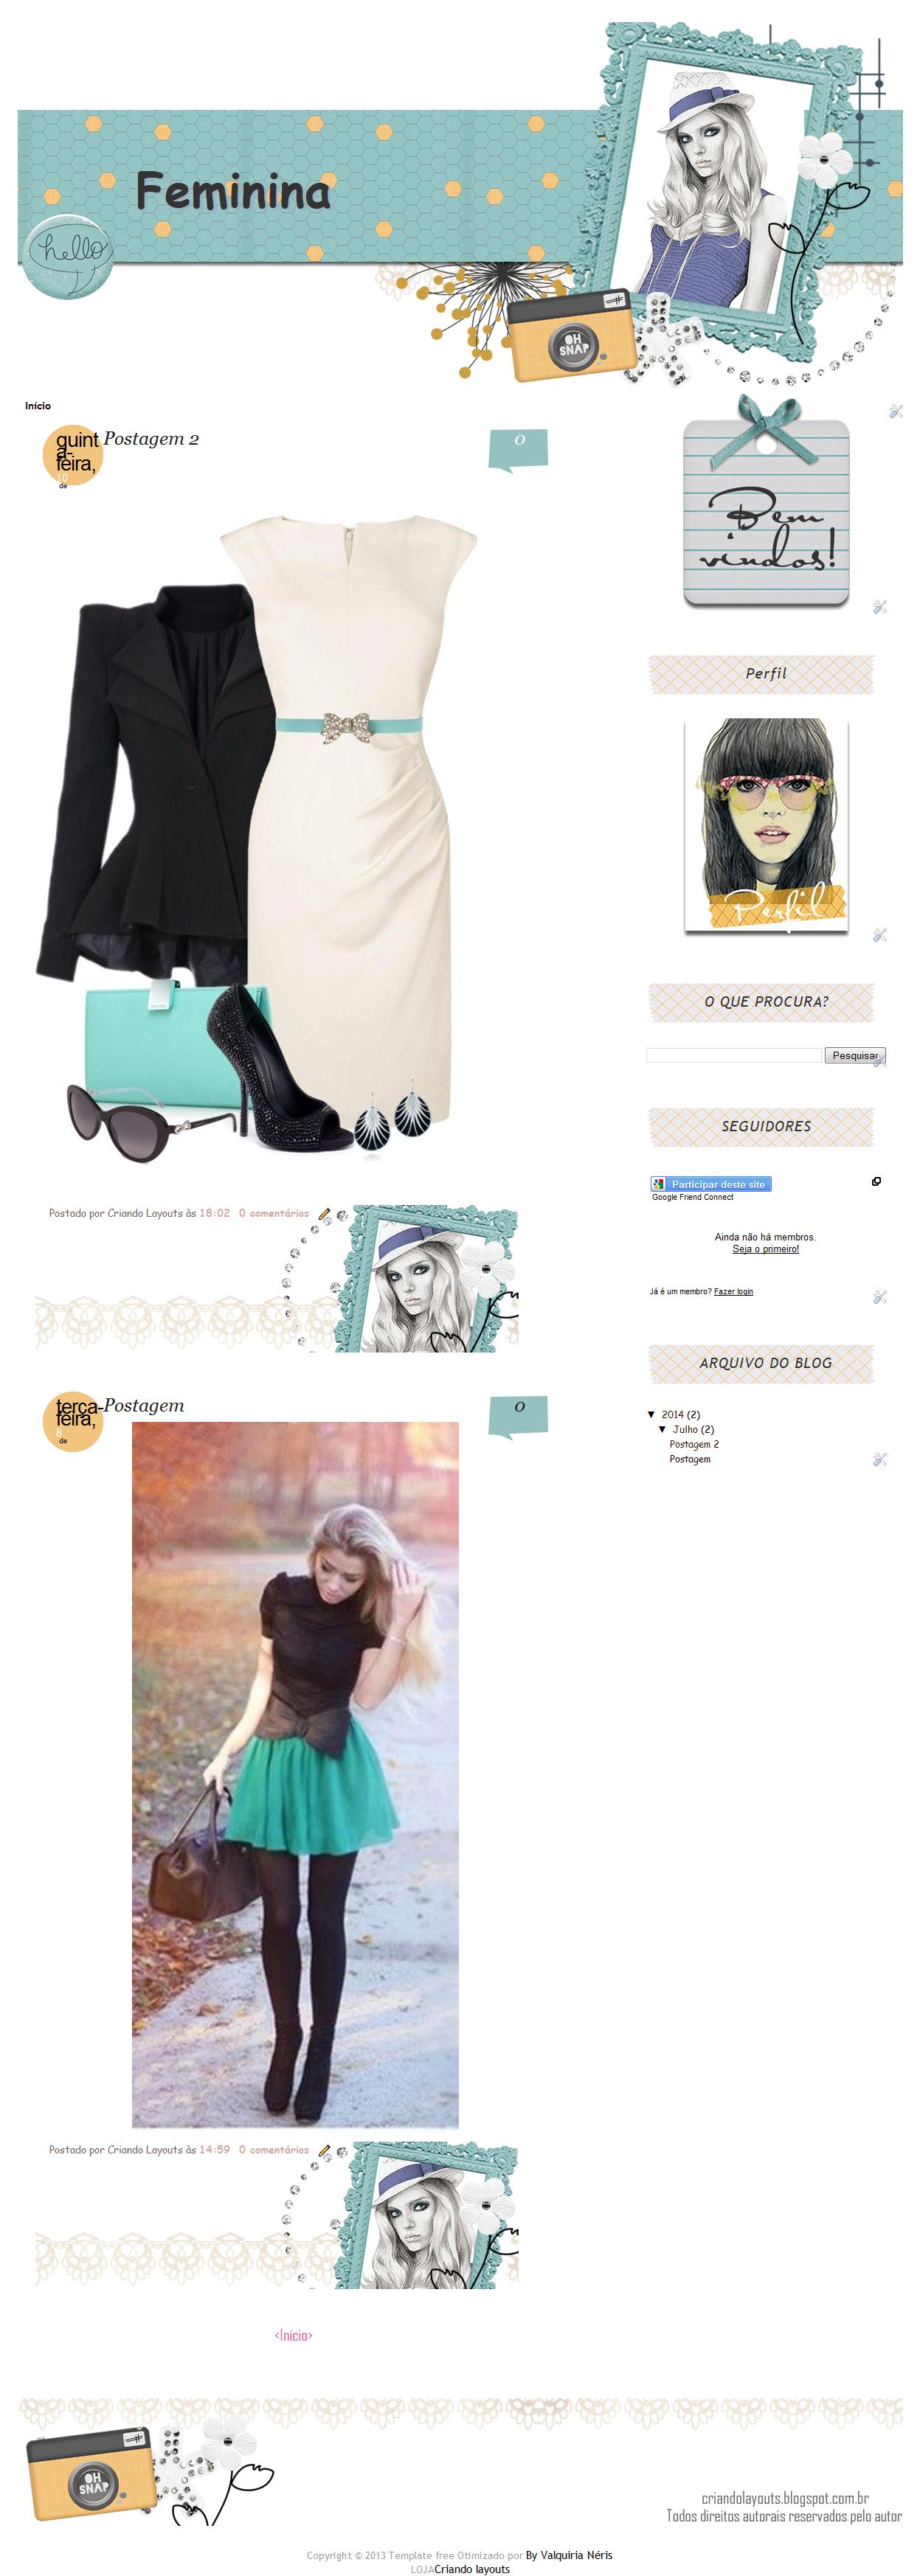 Template free feminino para blog | Template free para blog | Pinterest